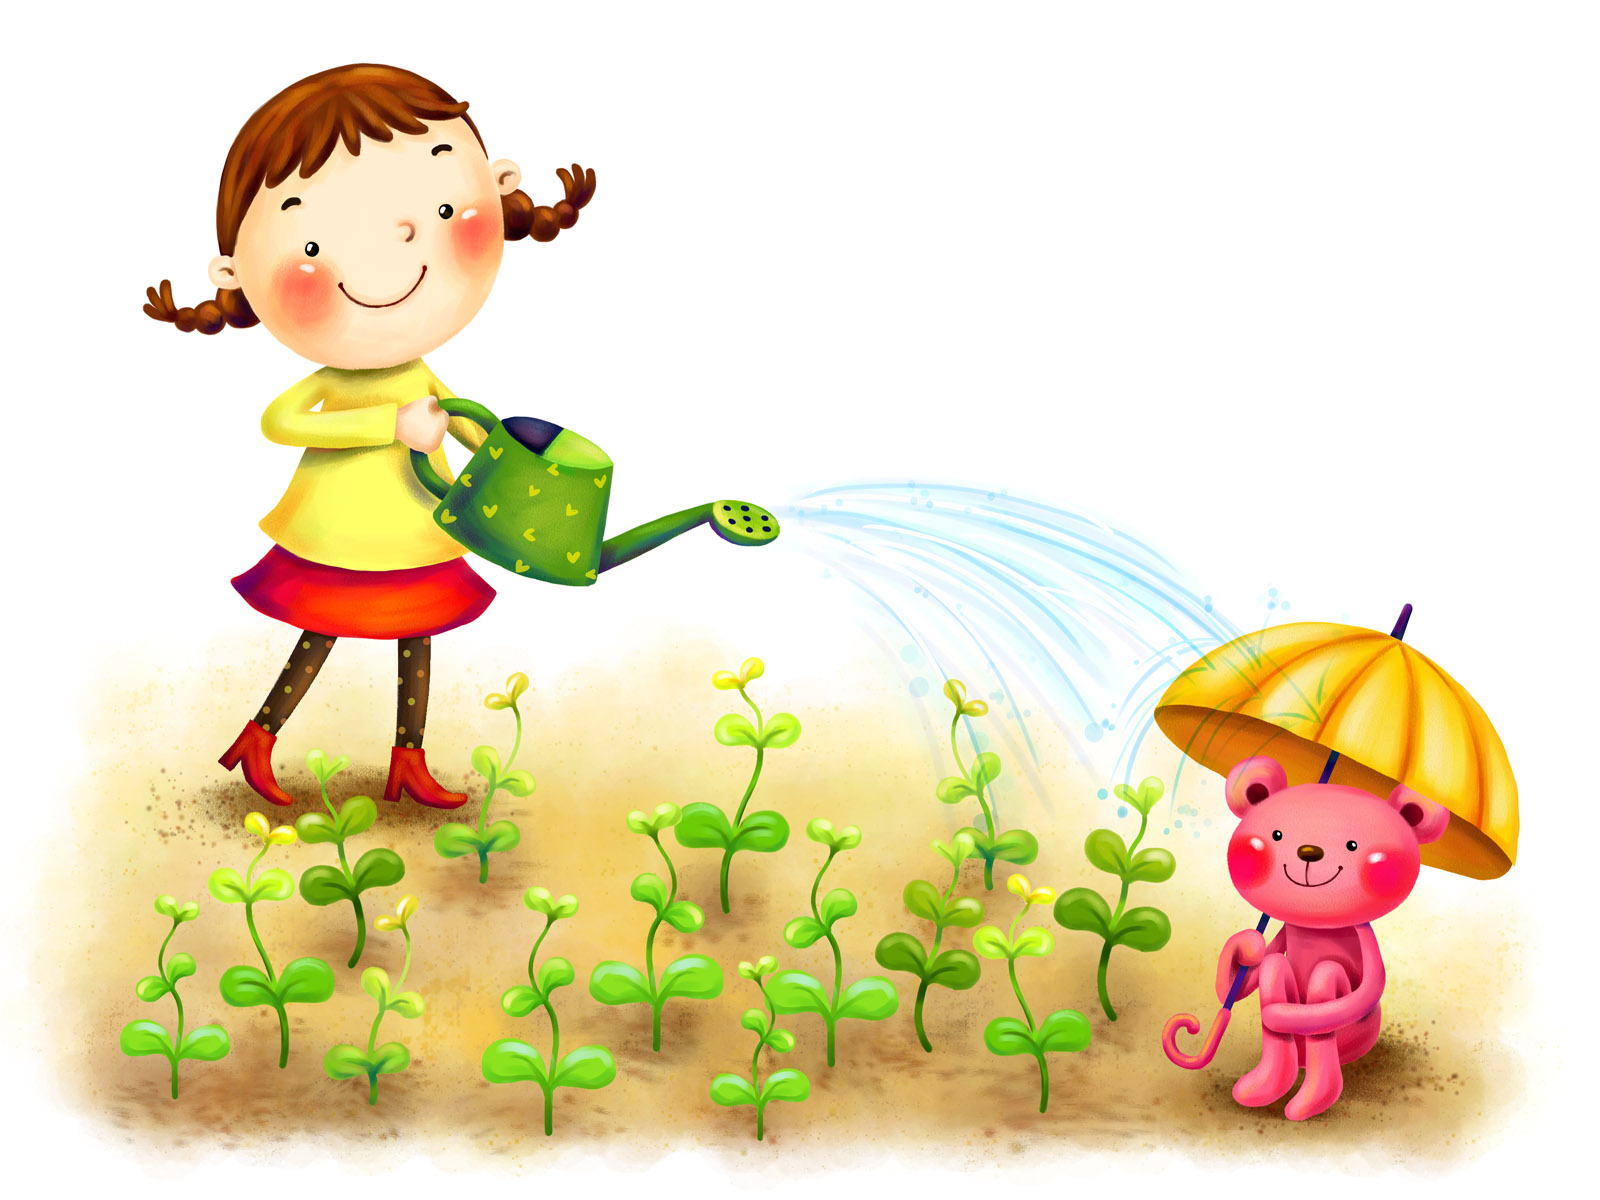 Children Hd Cartoon Wallpapers Free Download Hd Wallpapers